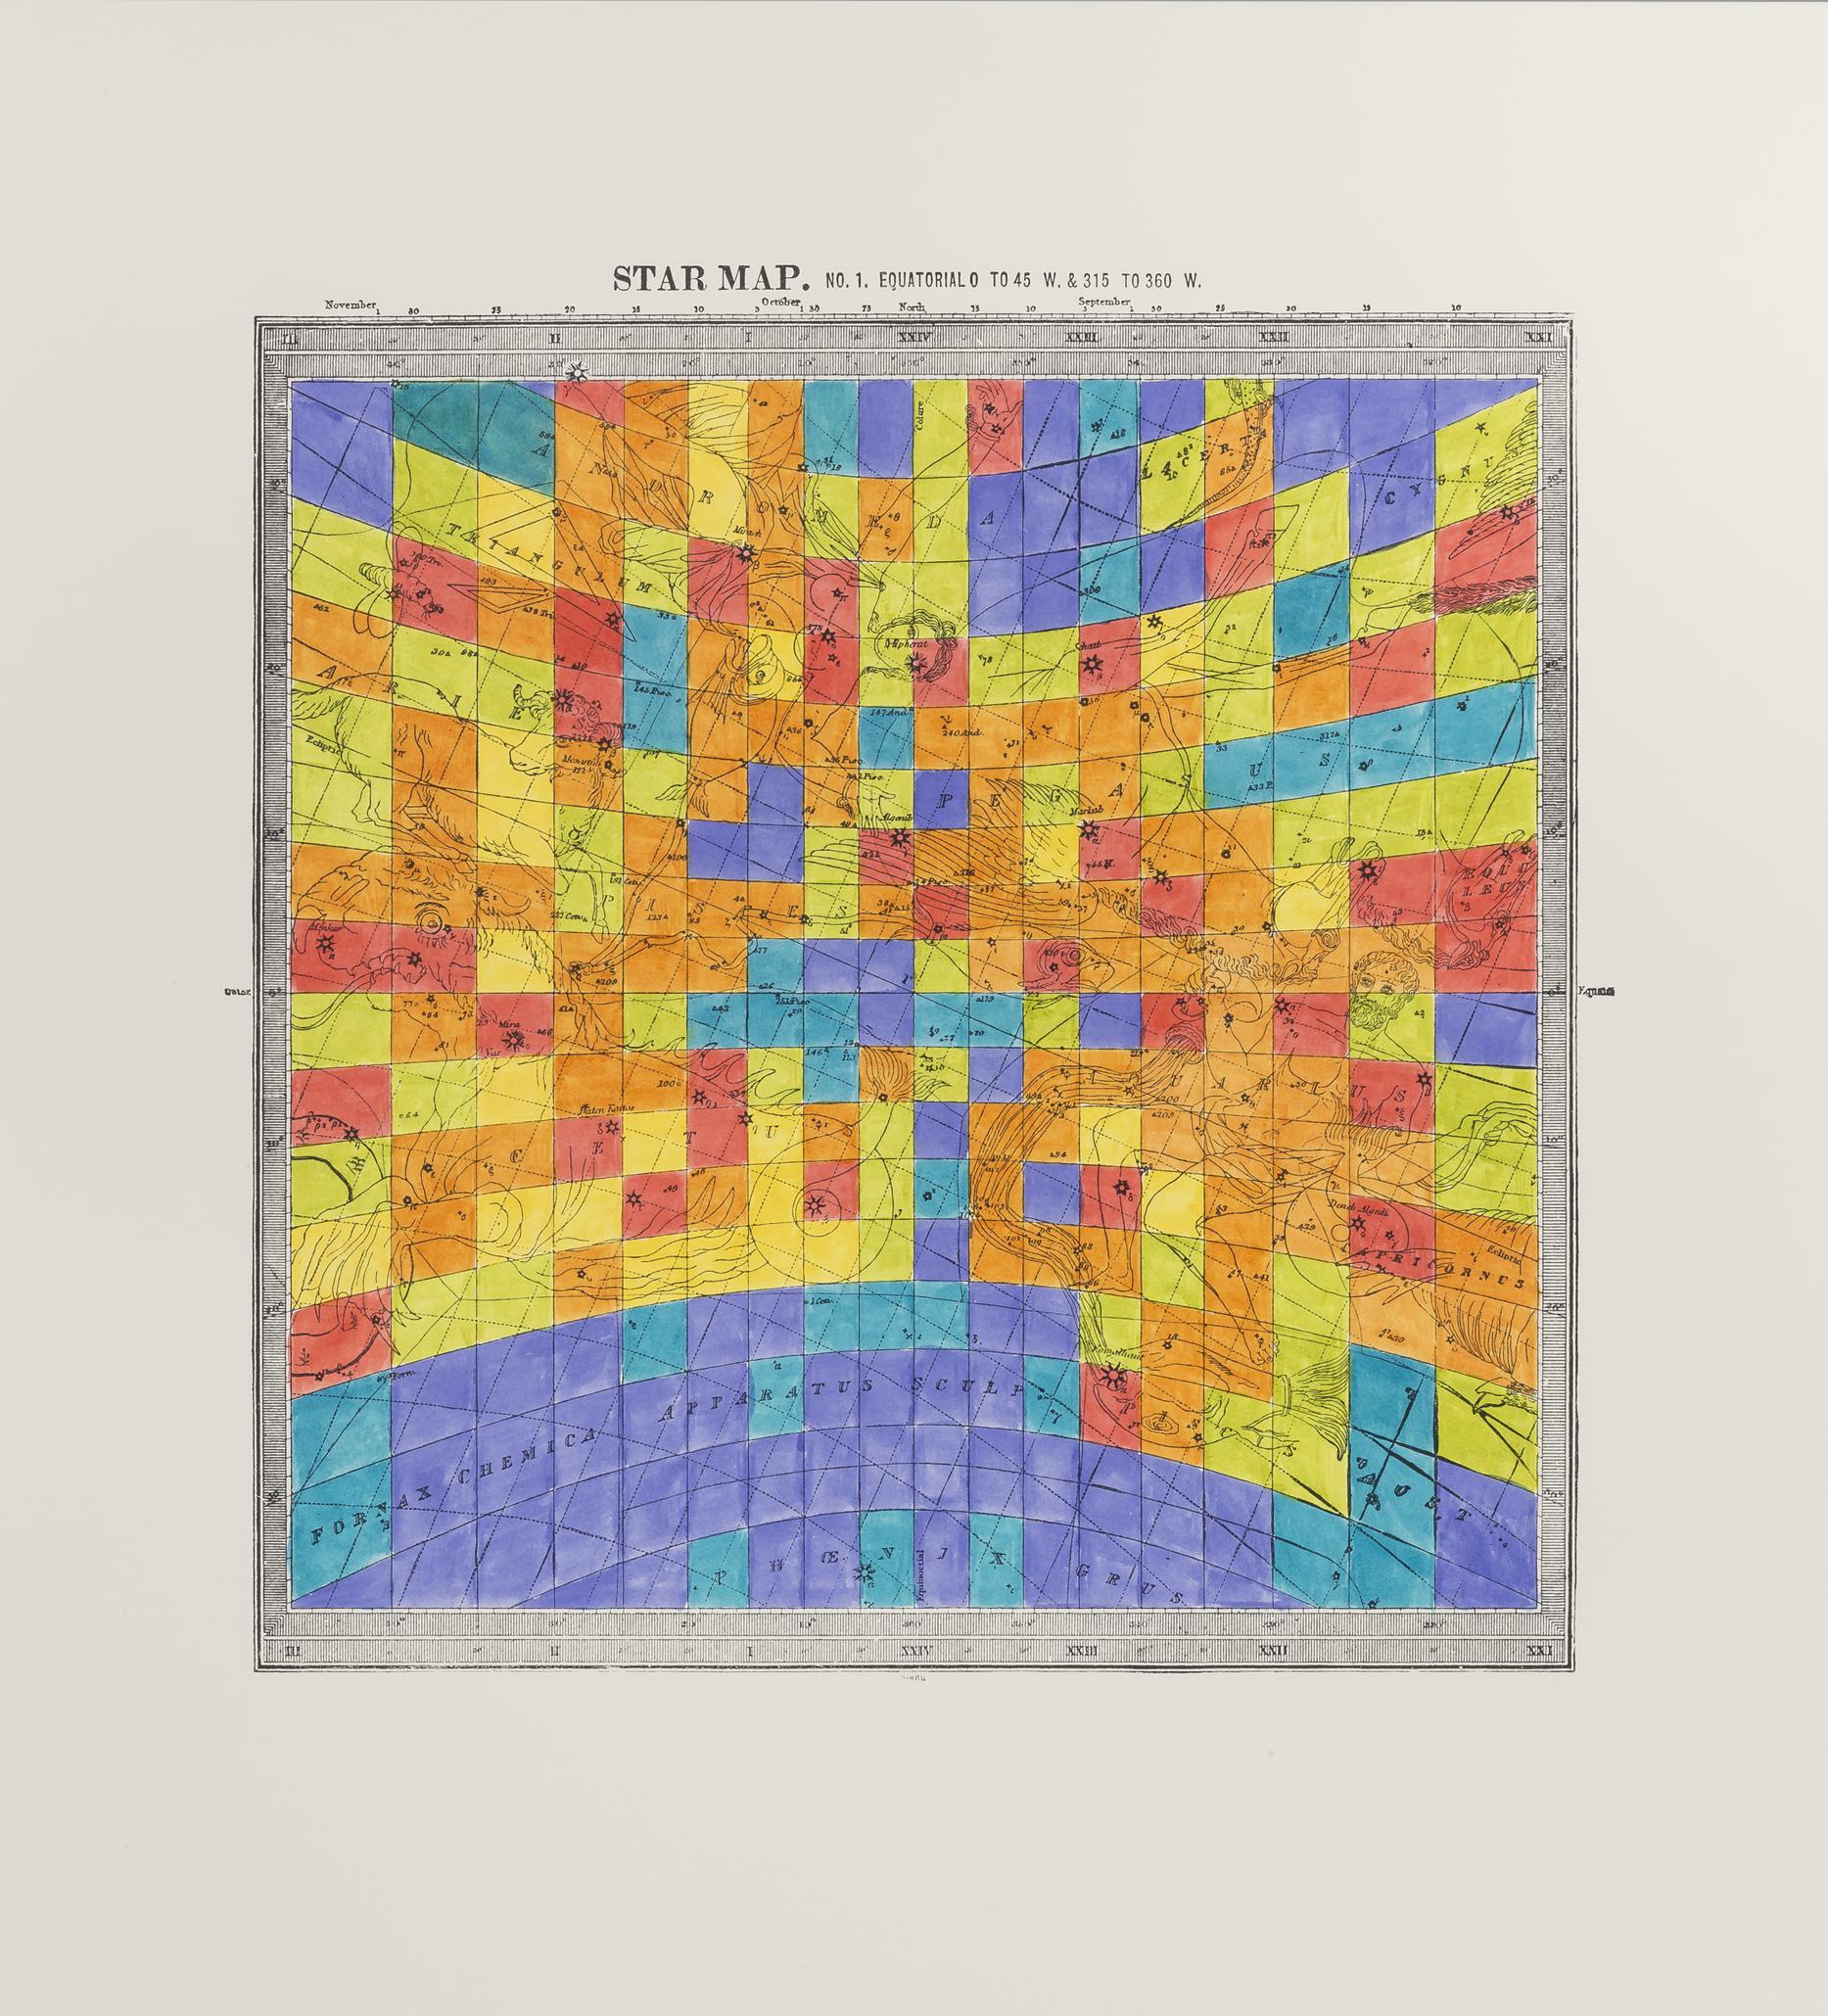 Star Value Set 3 Map 1 copy copy.jpg